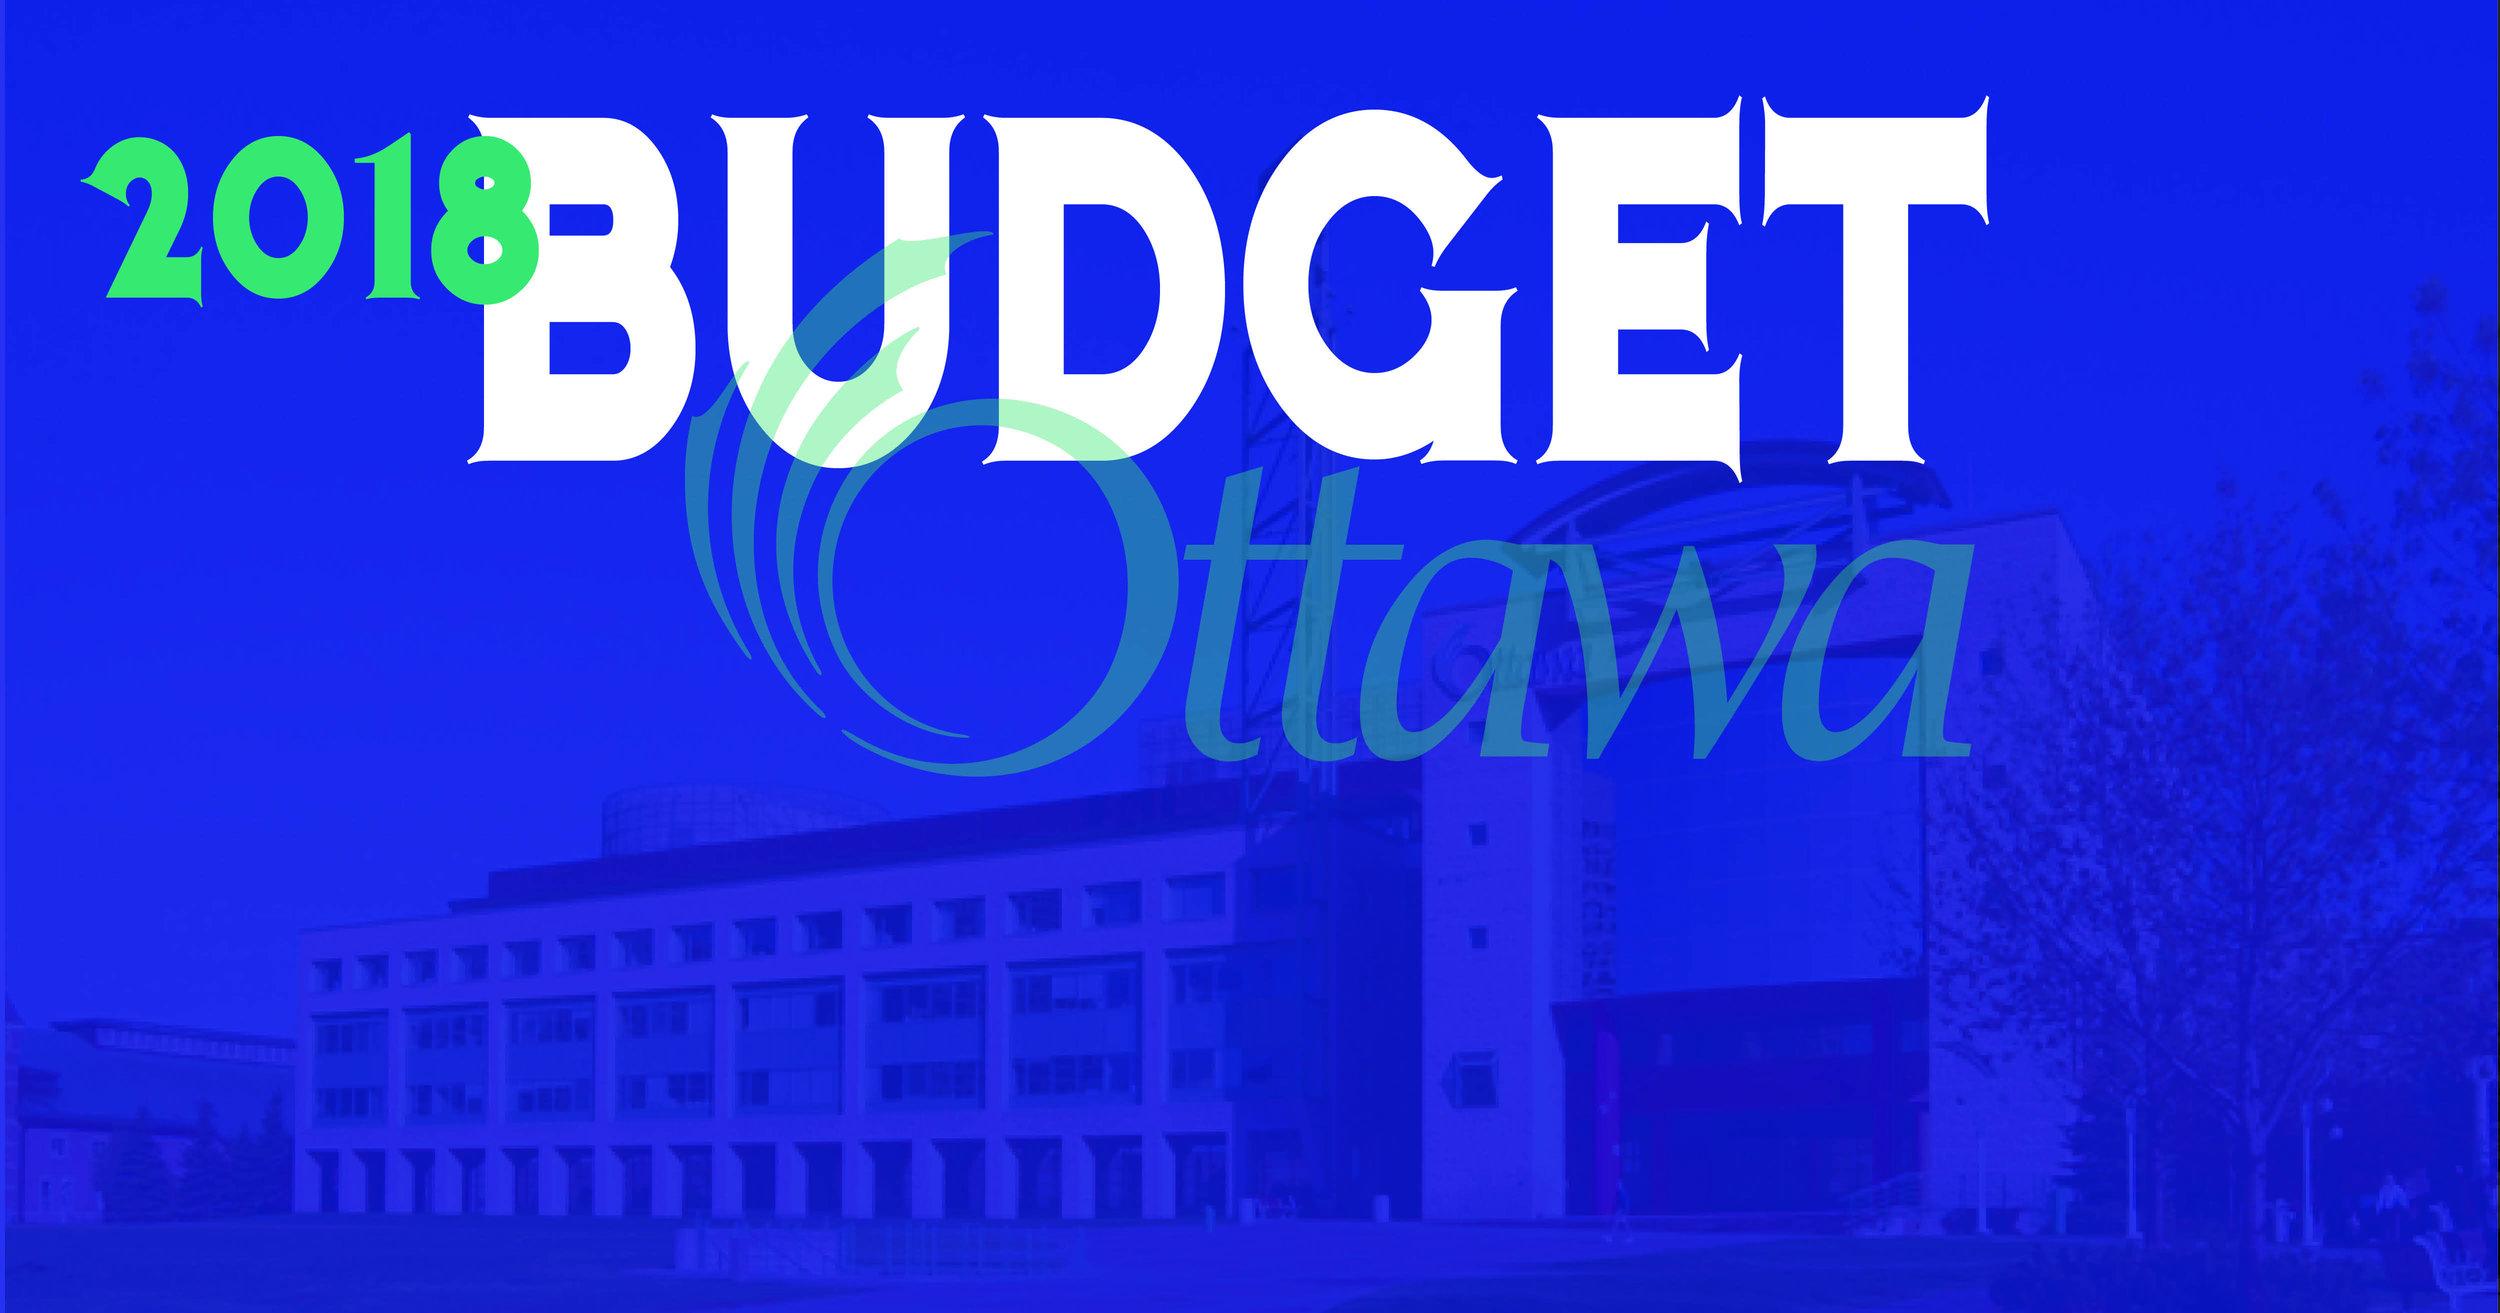 2018 Budget.jpg